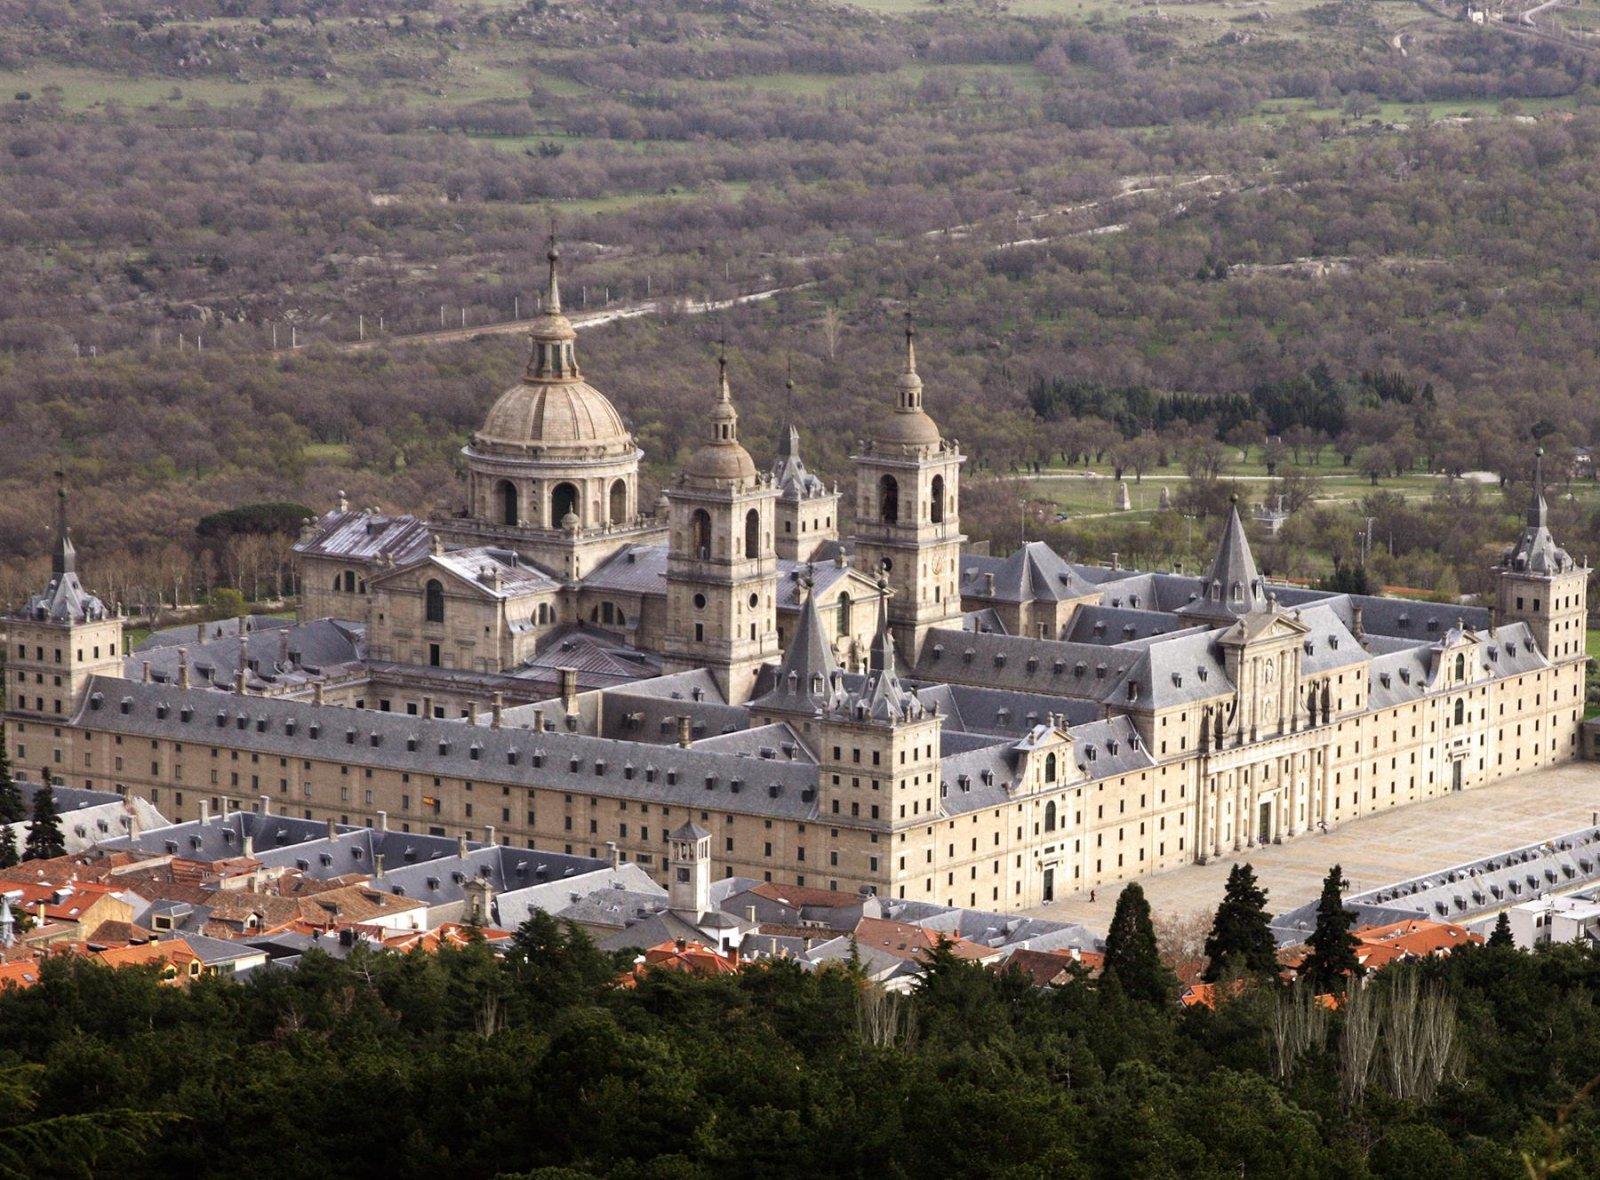 Монастырь Сан-Лоренсо-де-Эль-Эскориаль